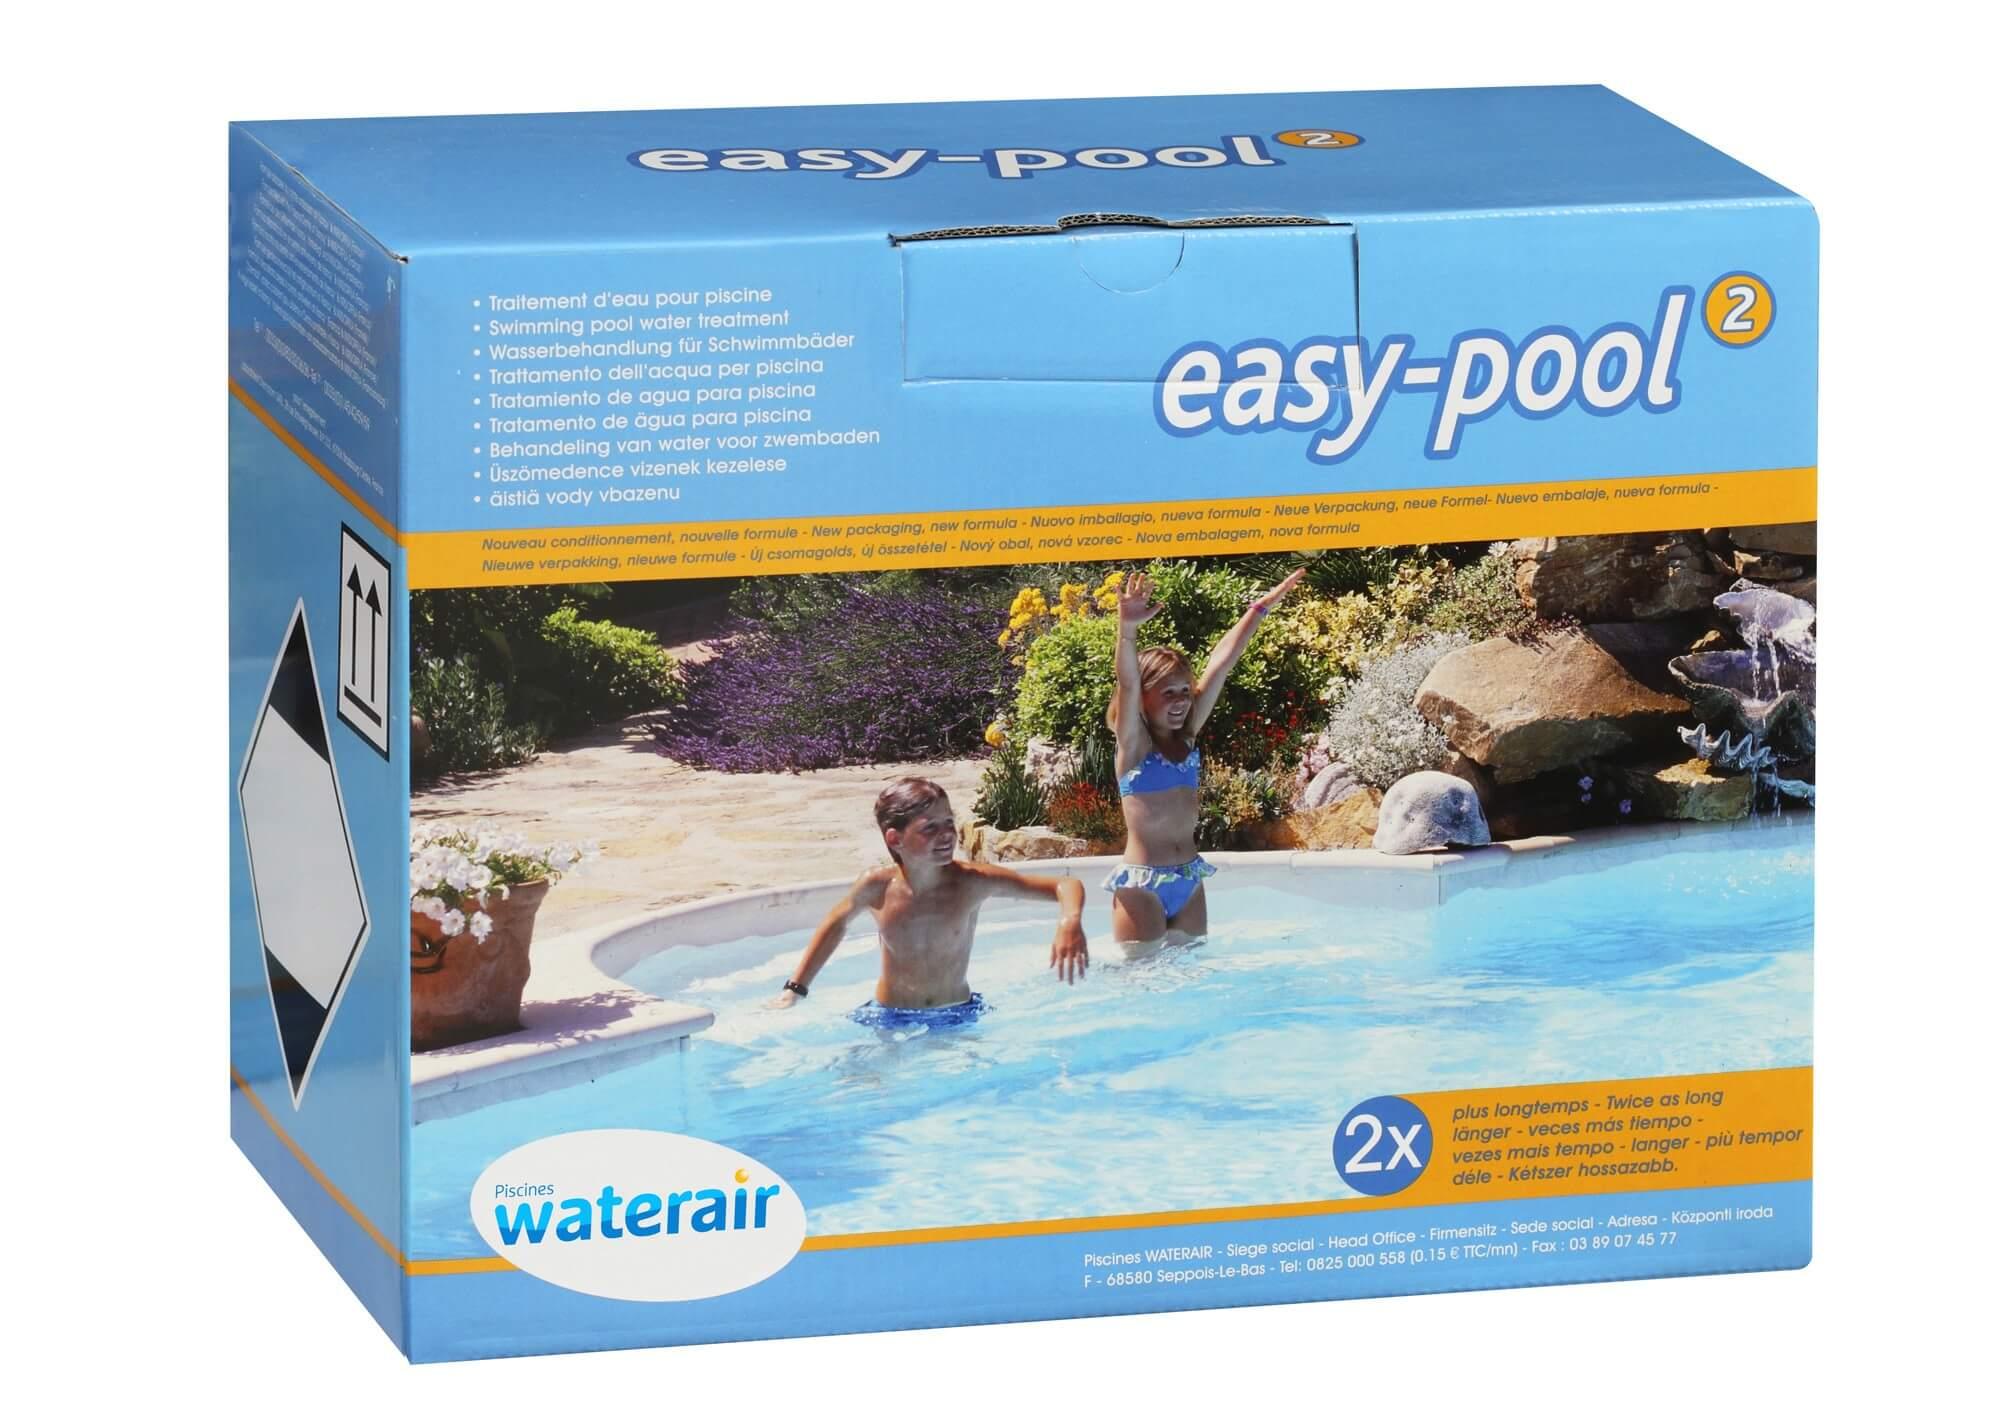 Traitement eau verte piscine waterair - Rattrapage eau verte ...